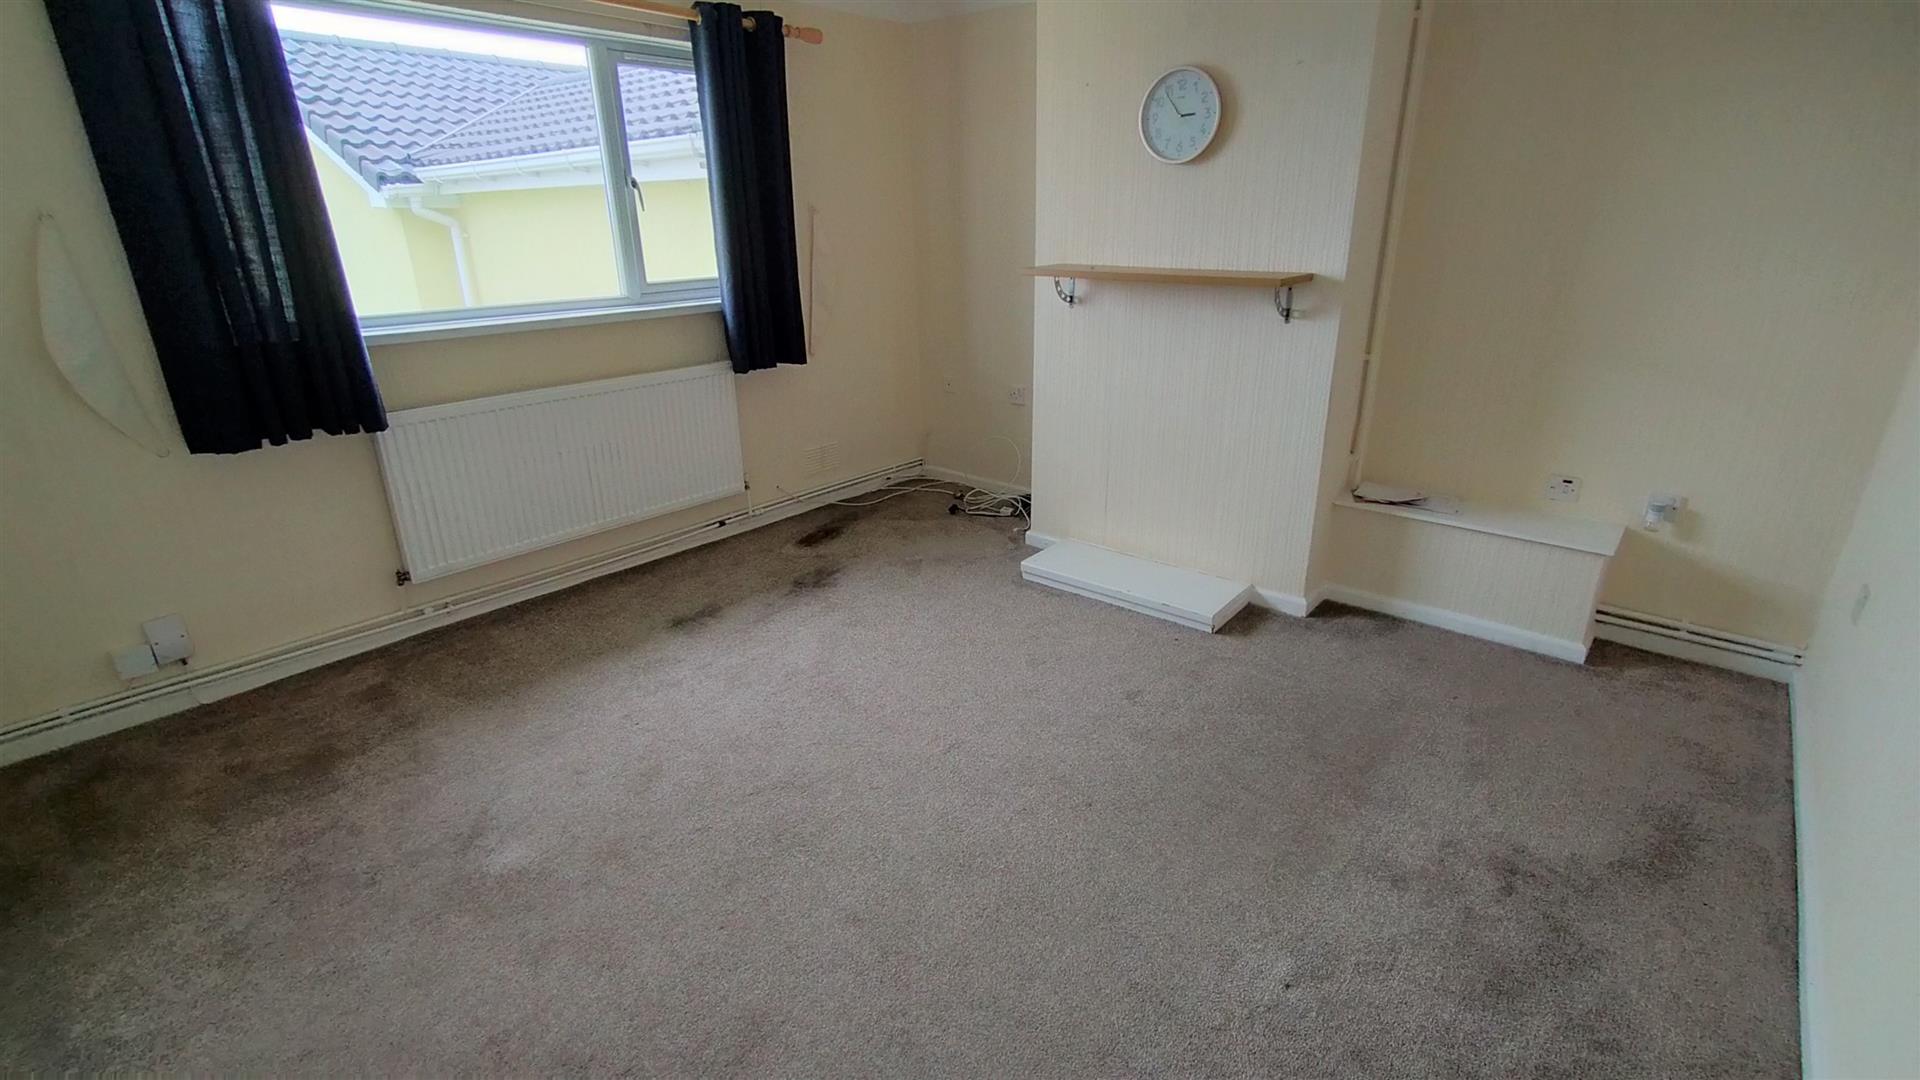 Kenilworth Place, West Cross, Swansea, SA3 5LL